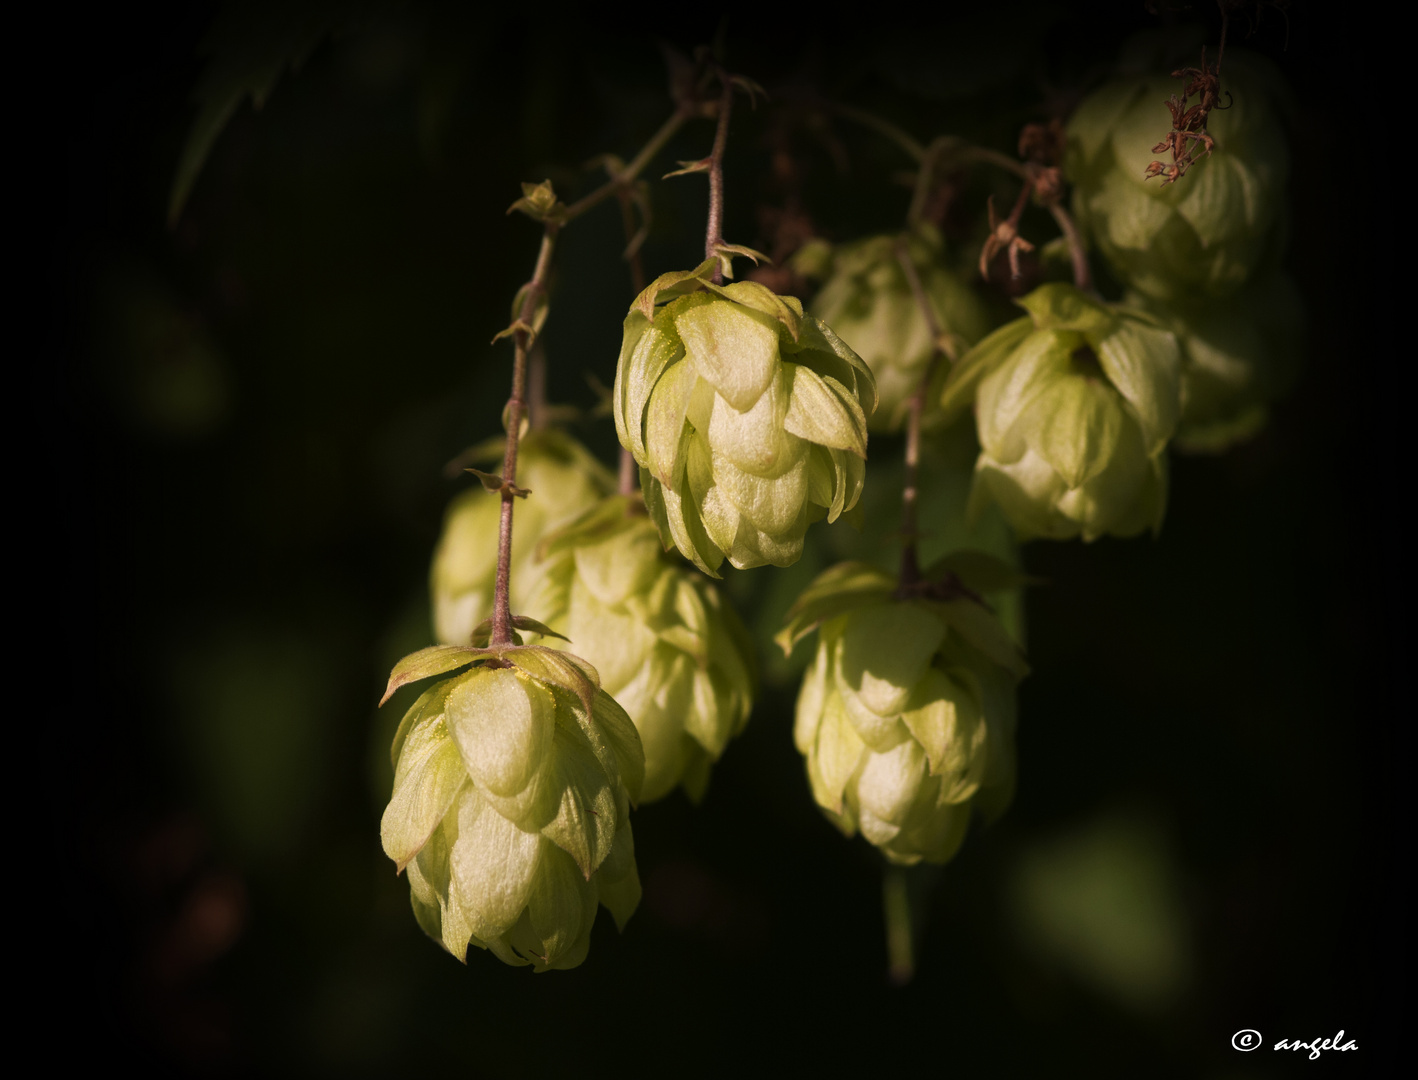 Lúpulo (humulus lupulus)